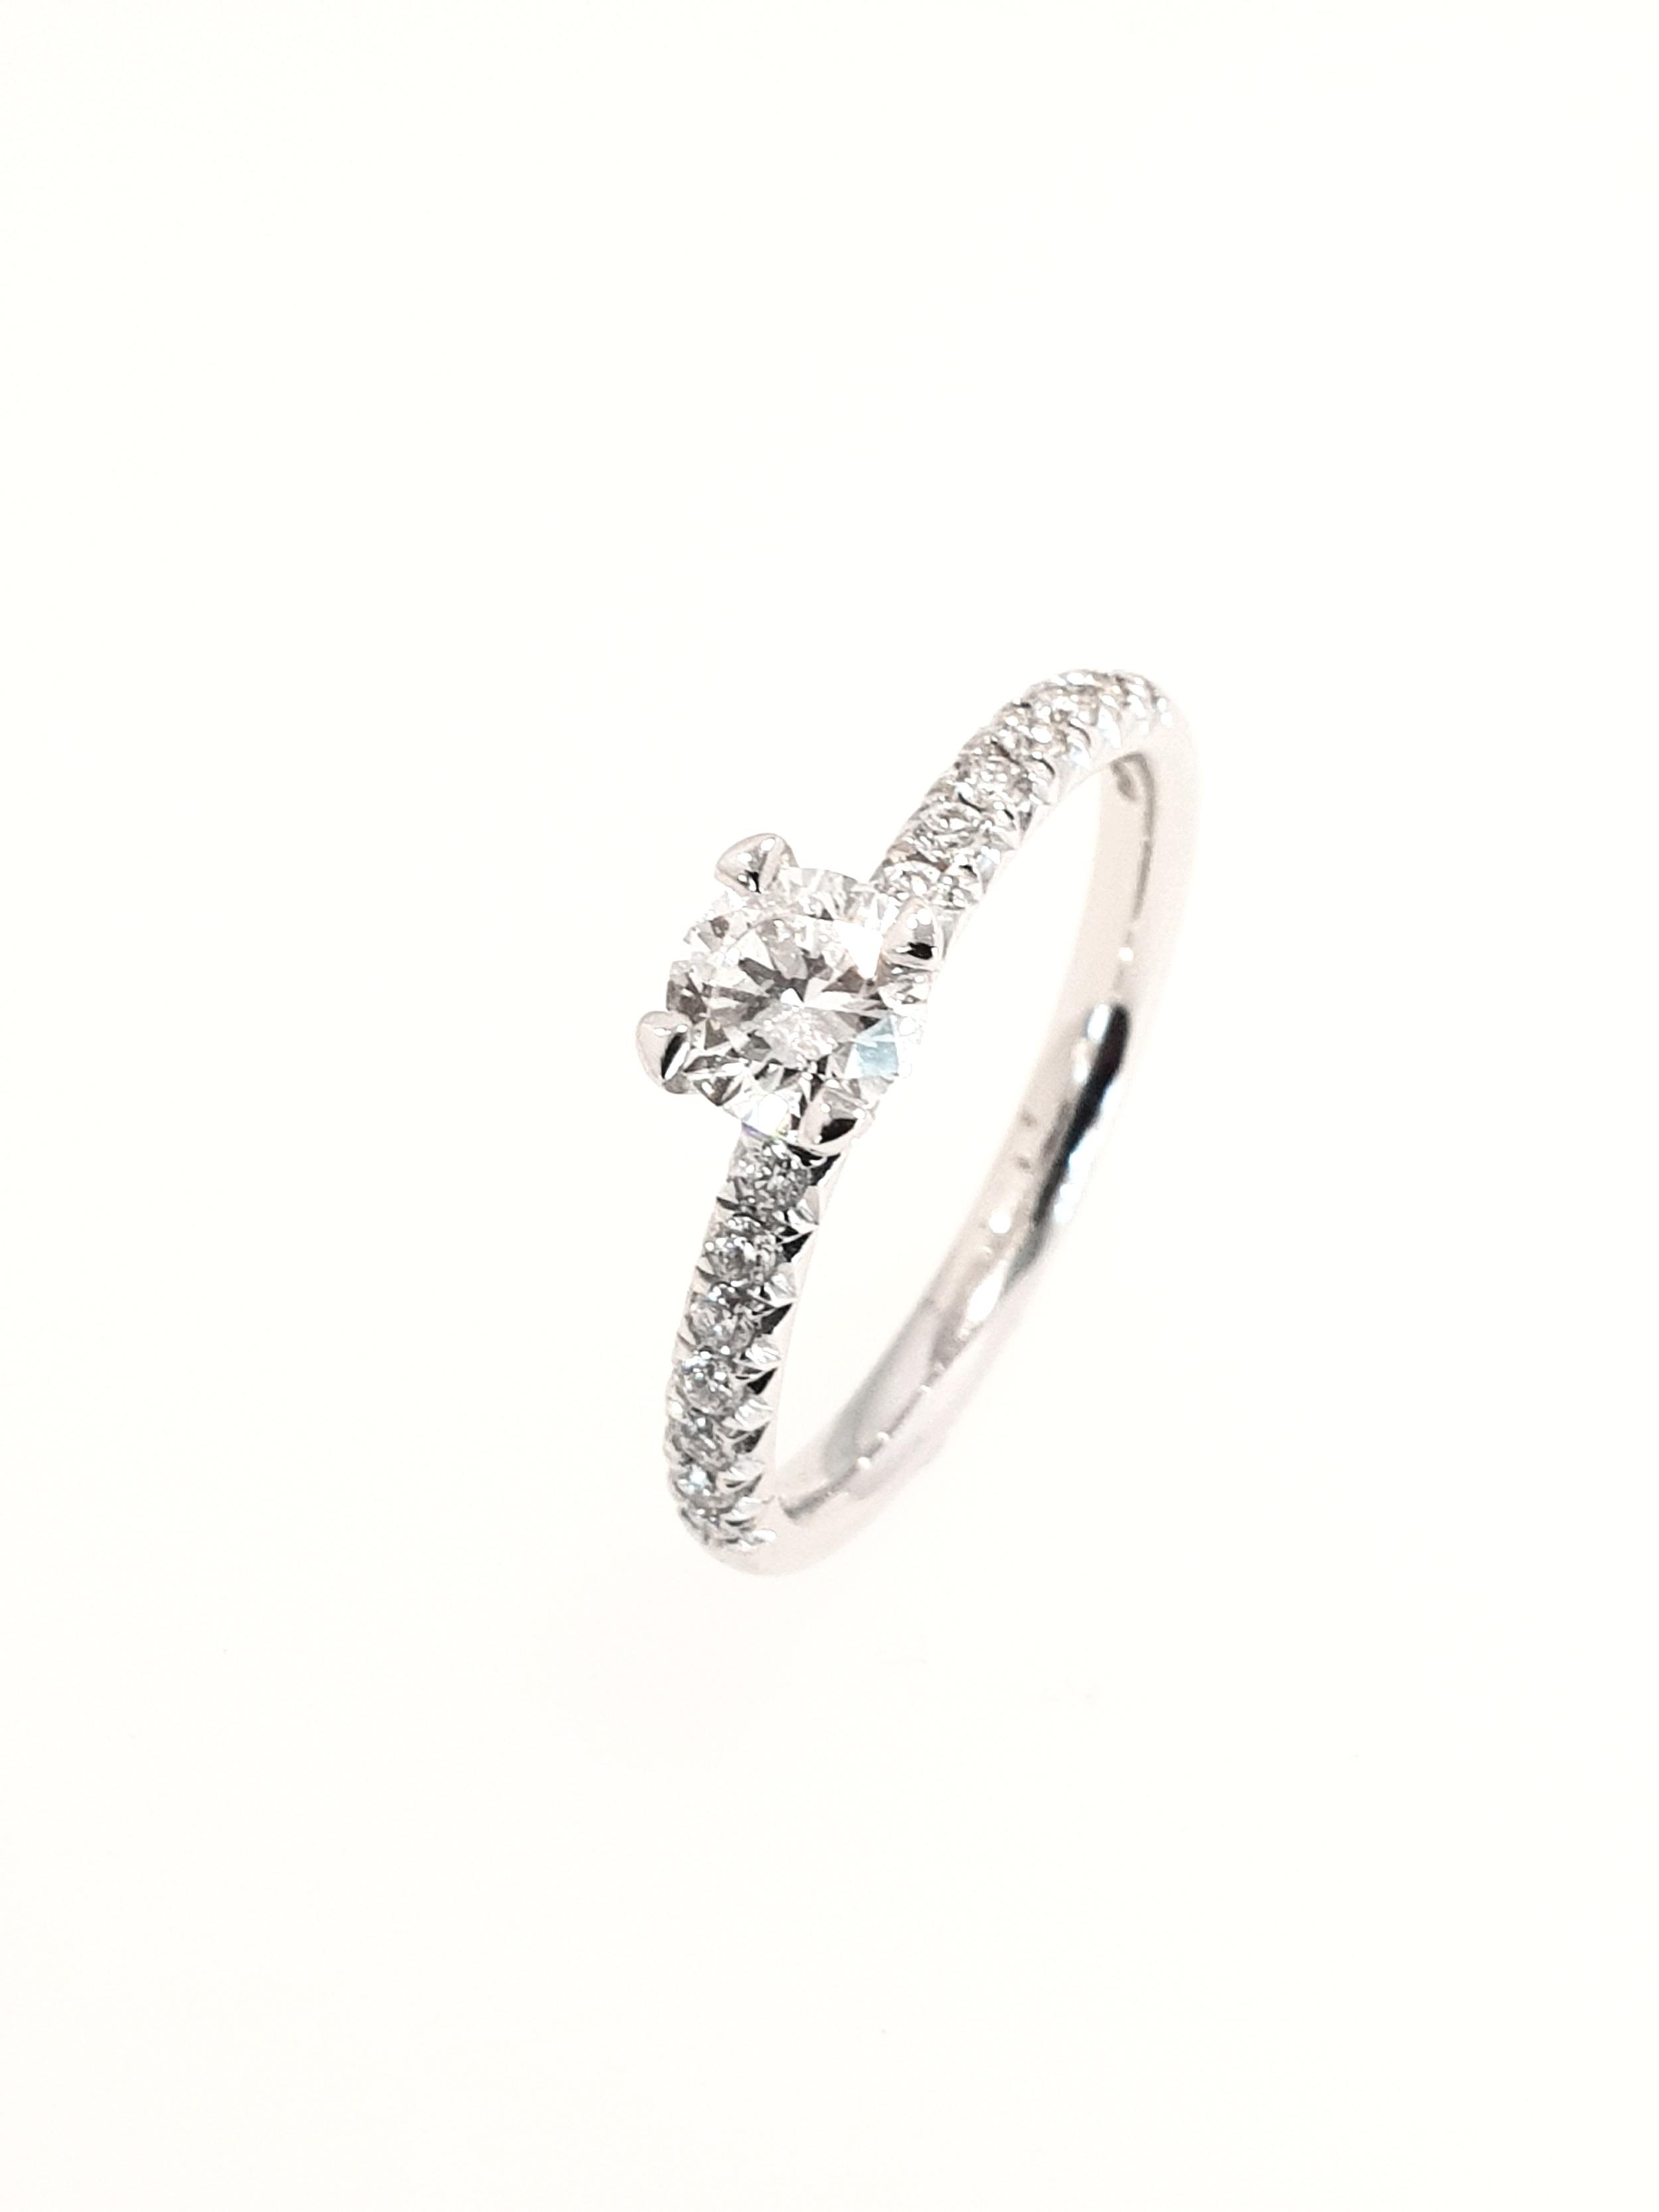 Platinum Diamond Ring, Tulip Set  .68ct, G, Si1  Stock Code: N8900  £3300